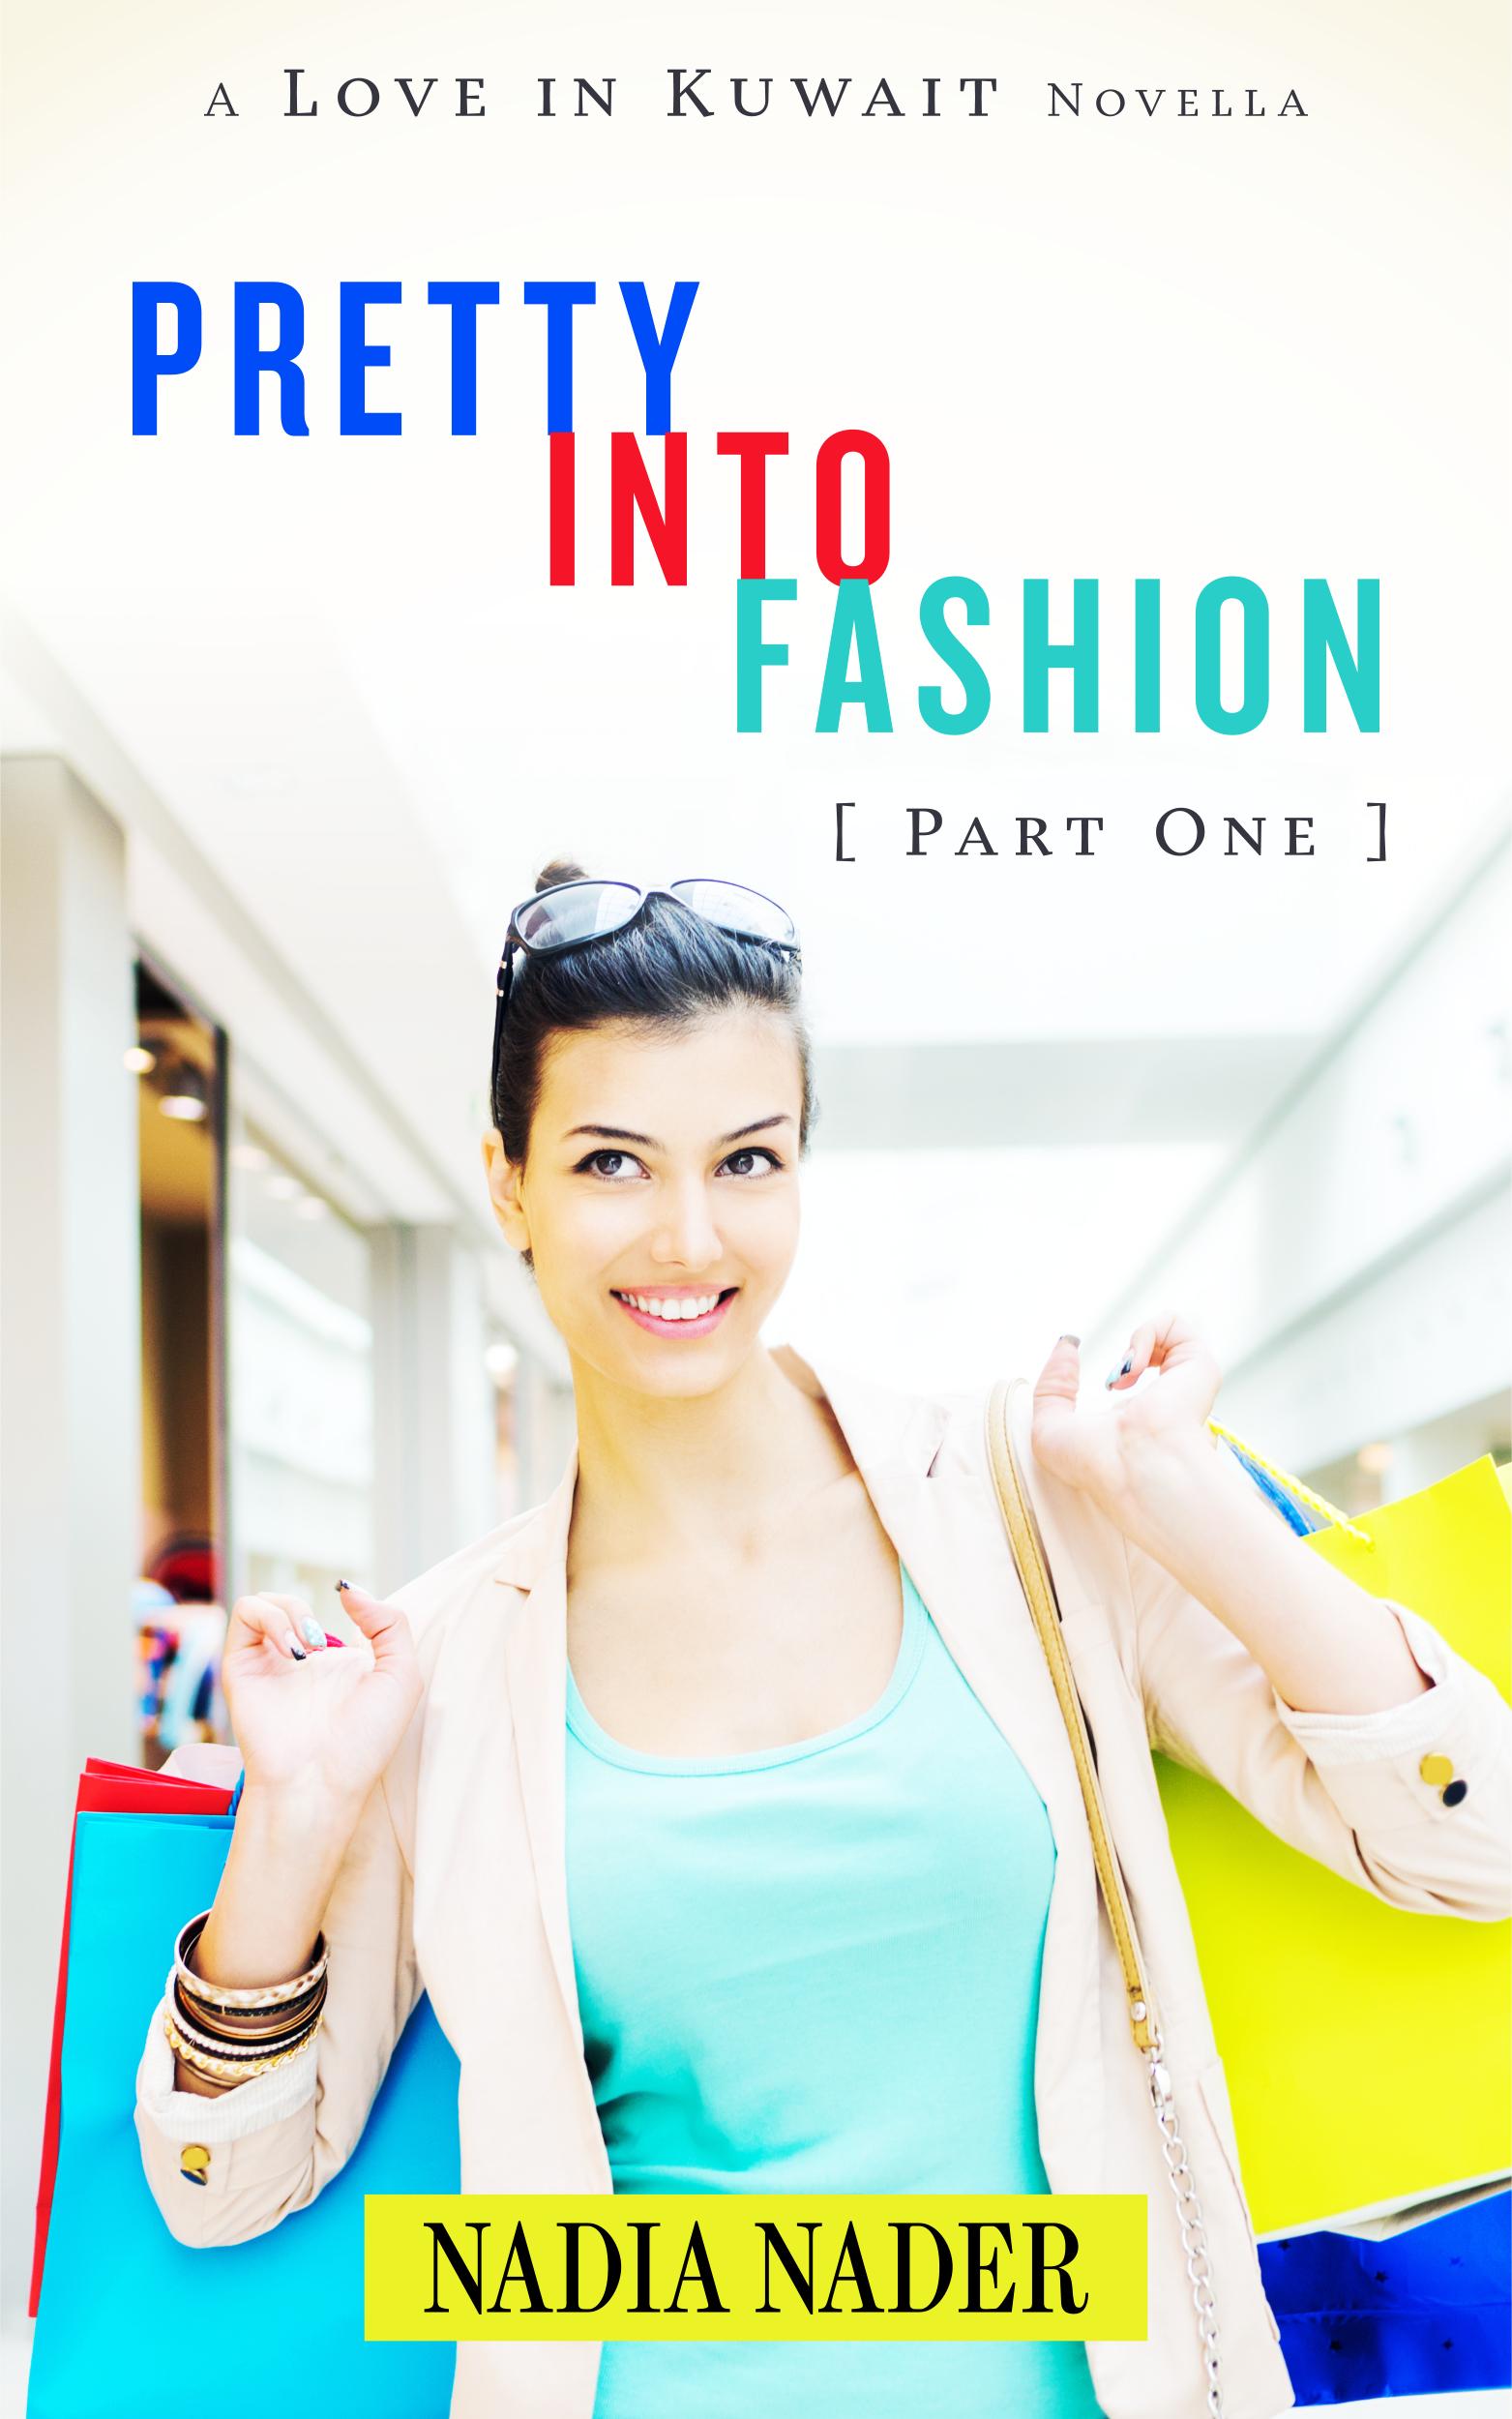 Nadia Nader Pretty into Fashion a Love in Kuwait Novella Part 1